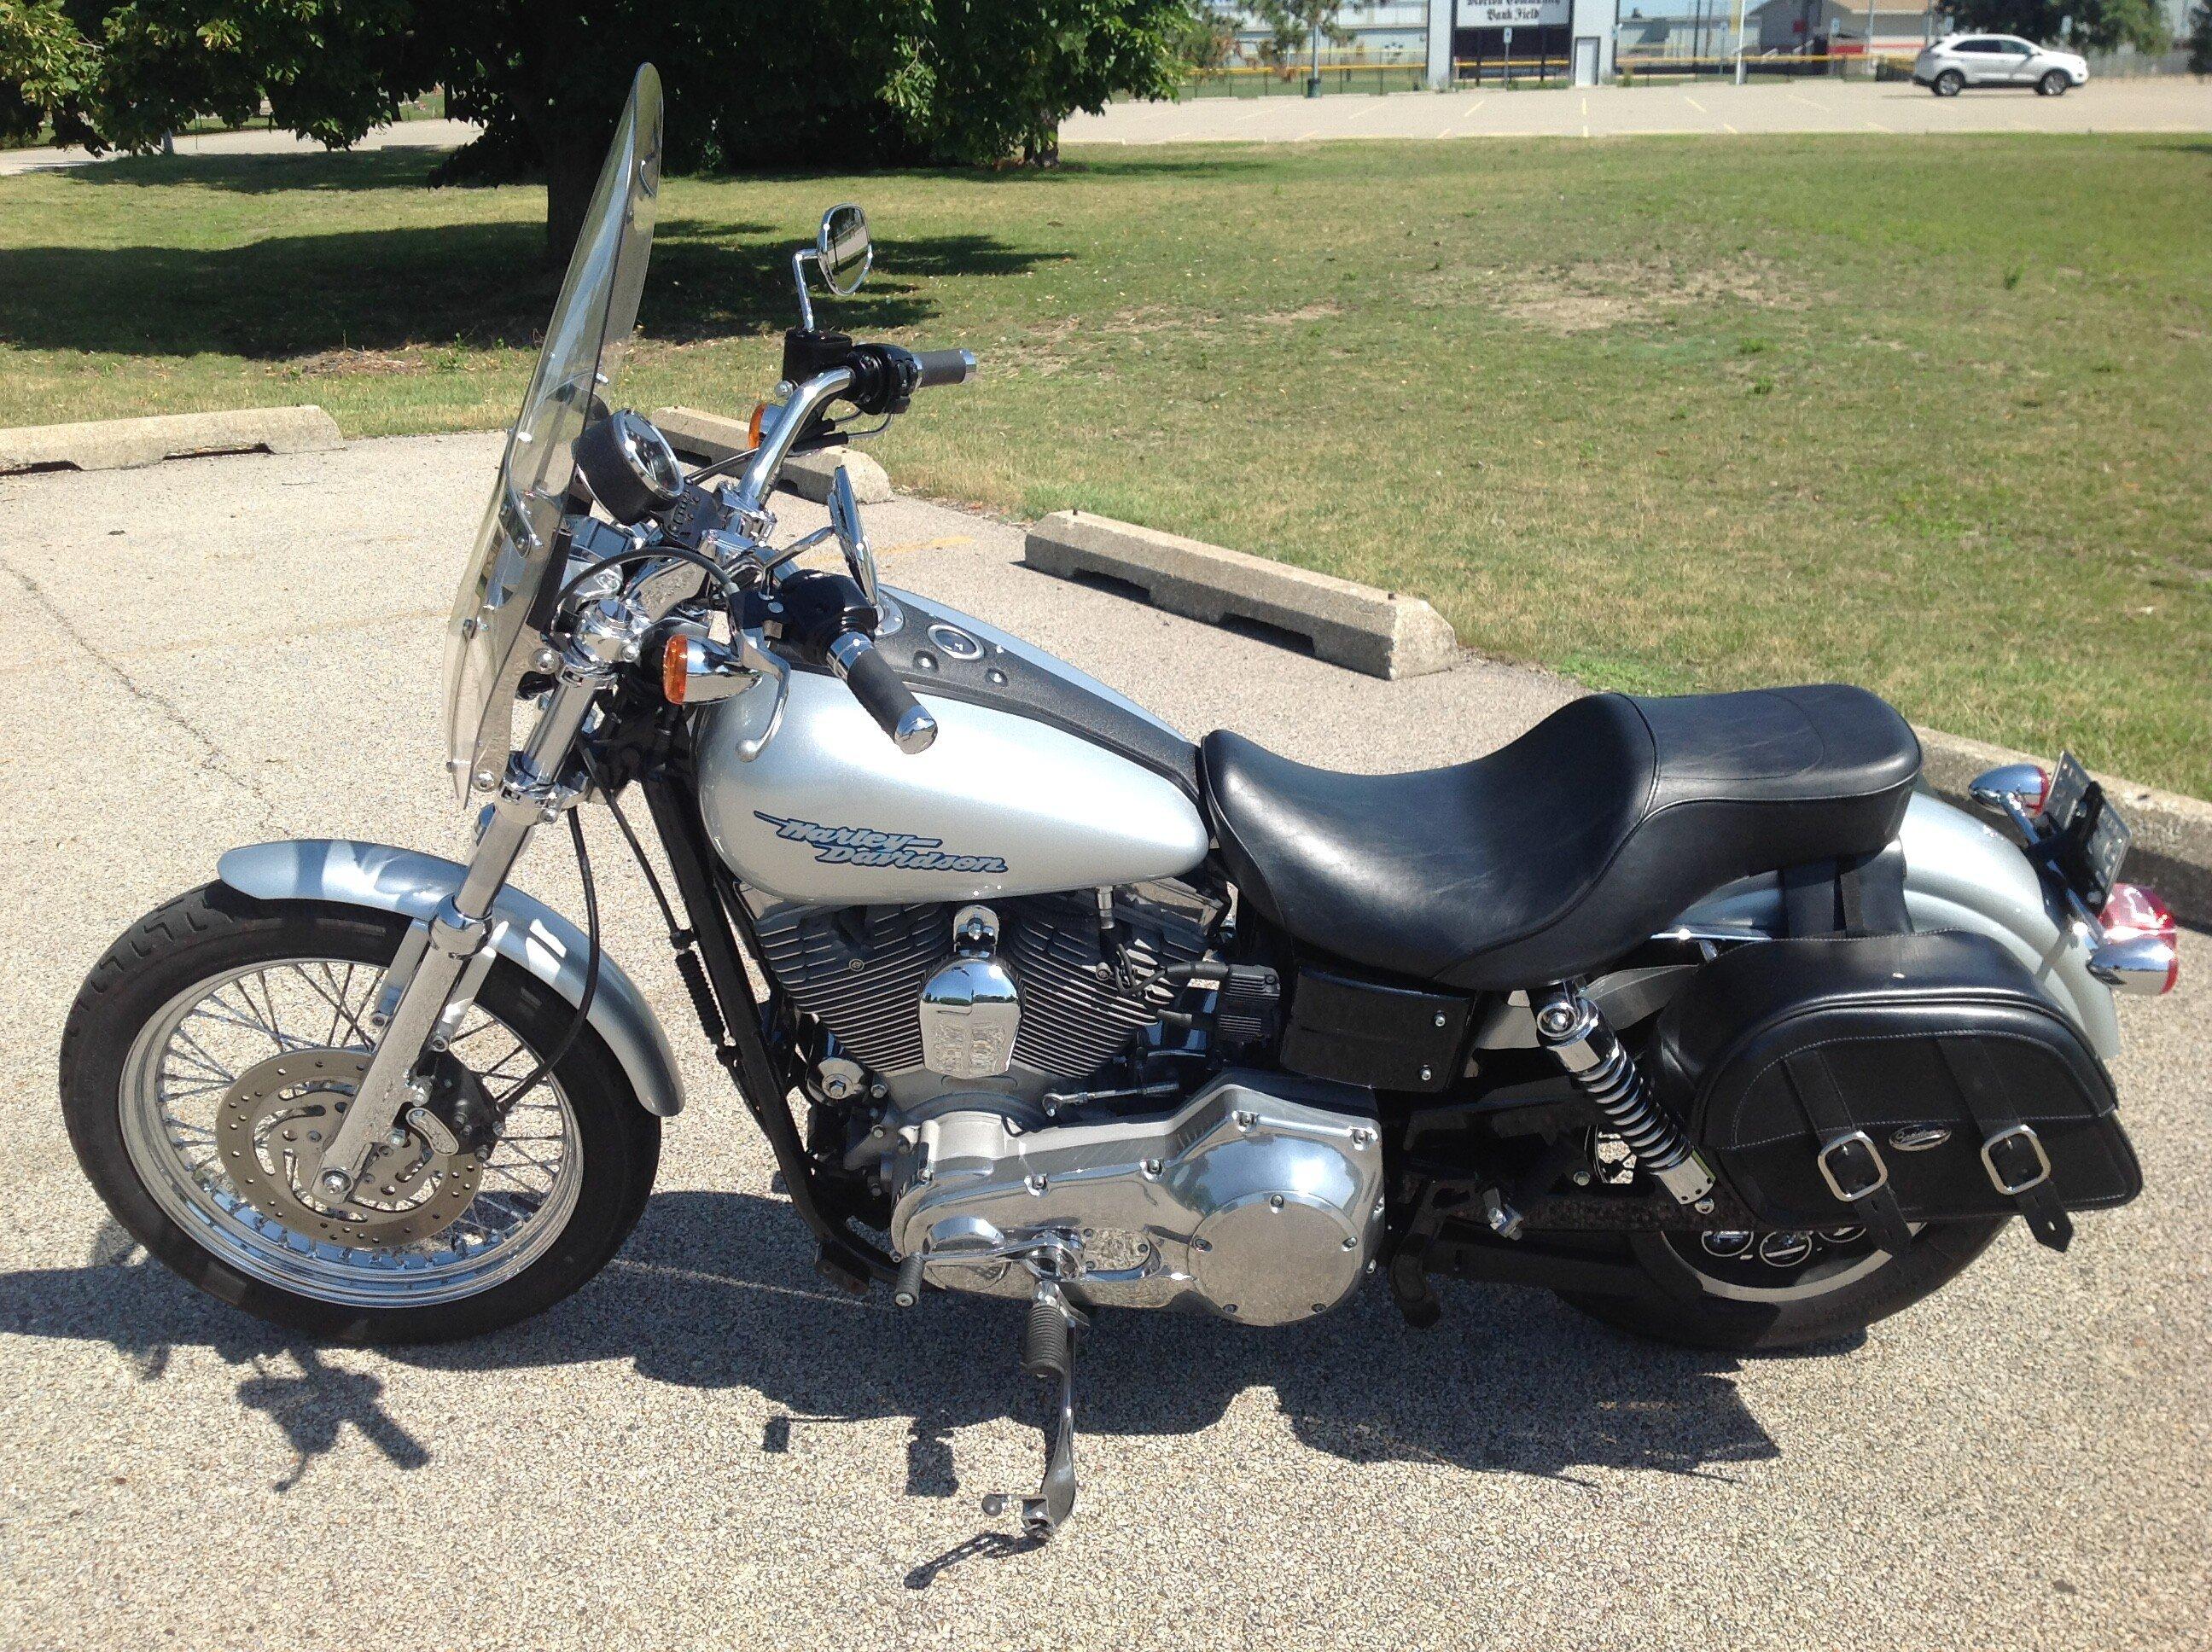 2004 Harley Davidson Dyna Wide Glide Off 57 Www Abrafiltros Org Br